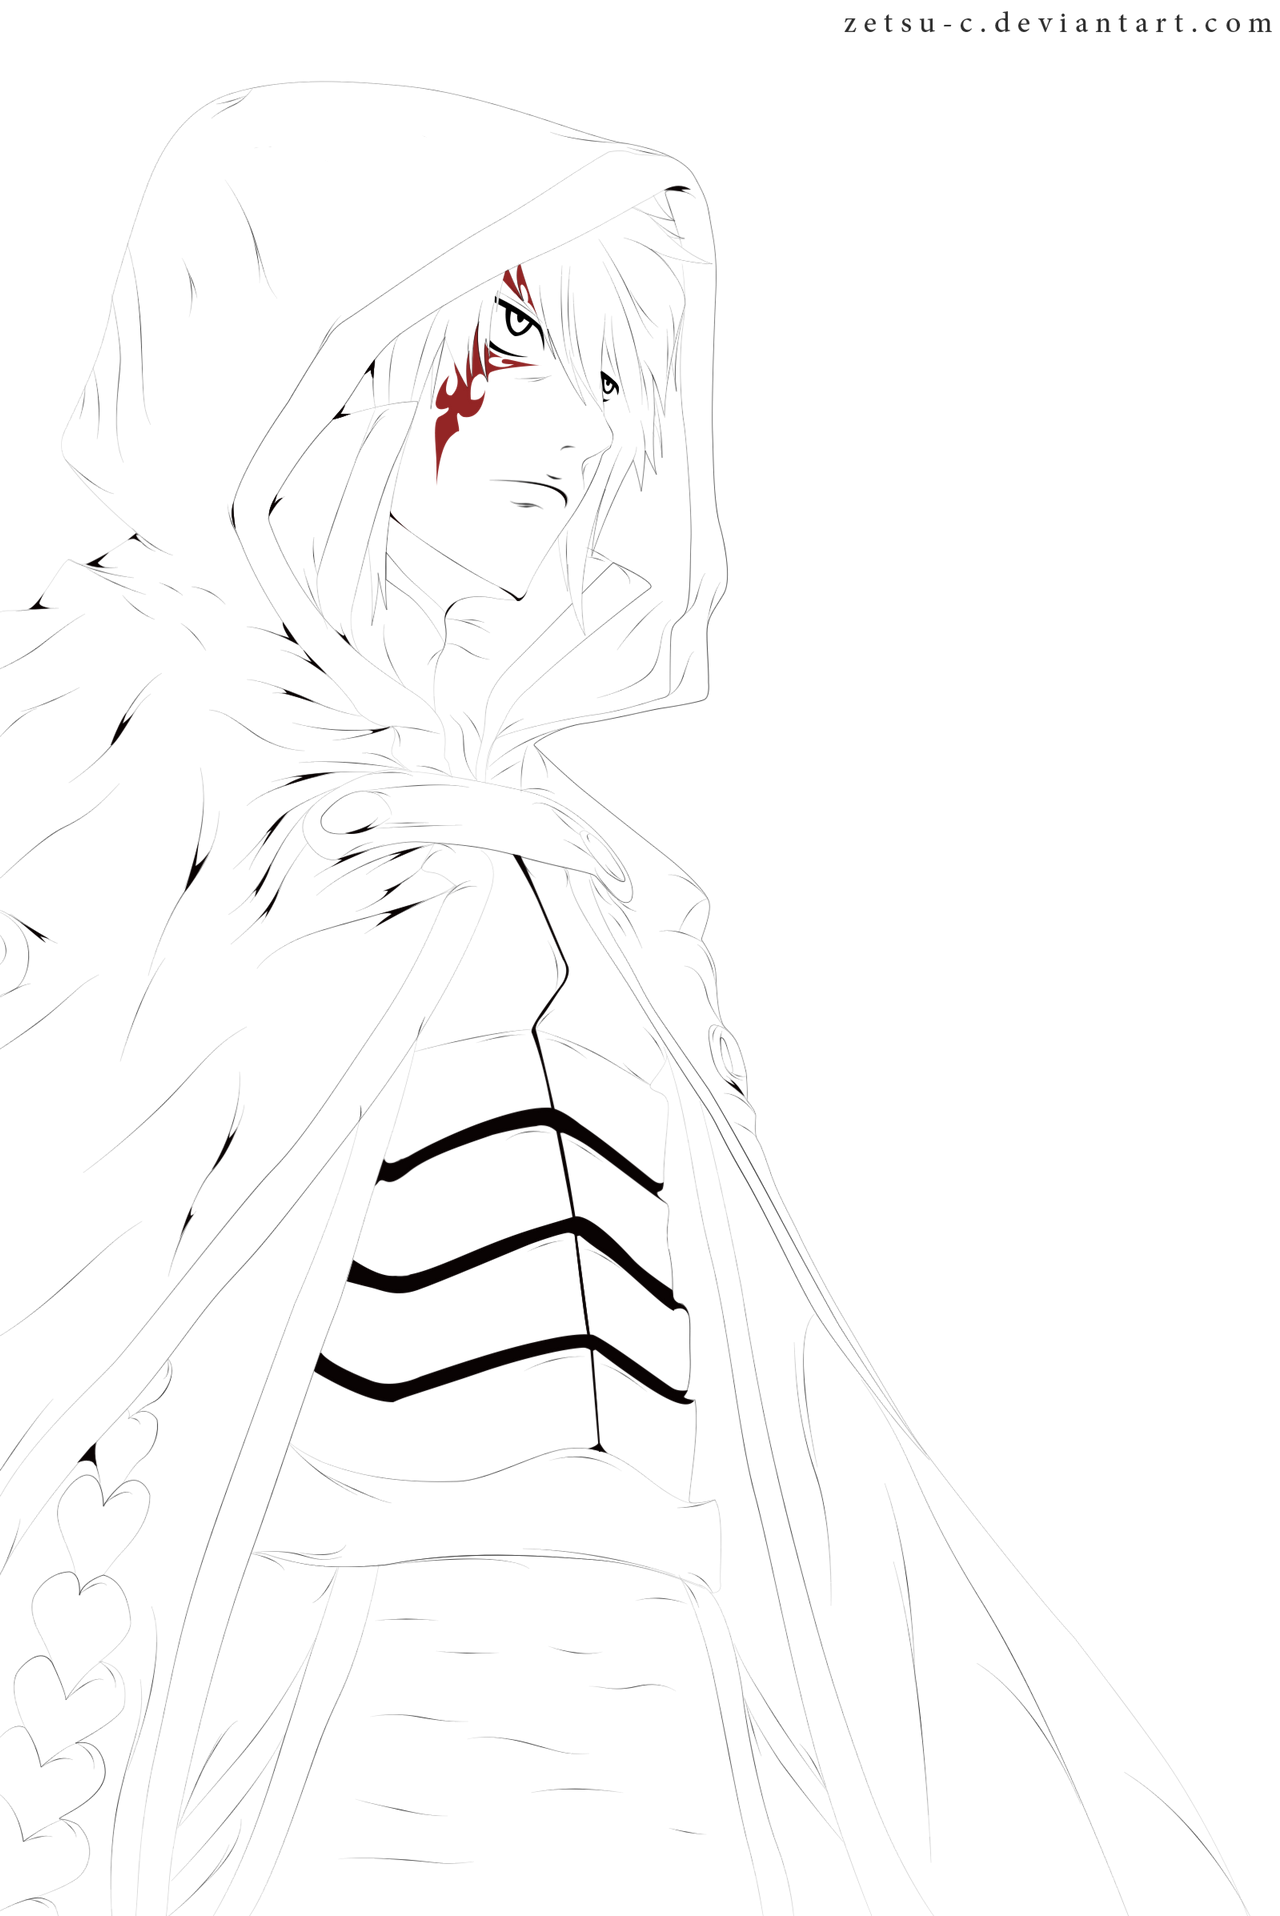 Fairy Tail 364 - Jellal Lineart by ZeTsu-c